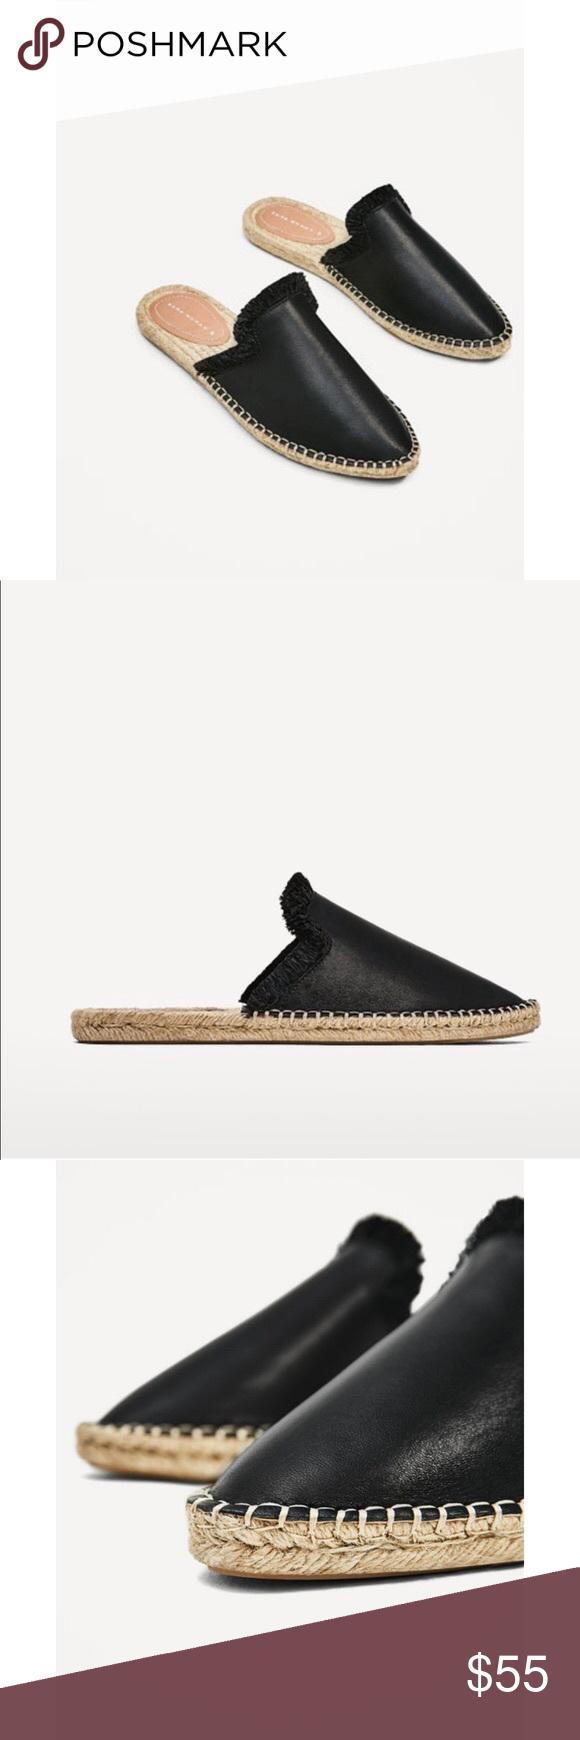 NWT Zara Black Leather Espadrille Mules